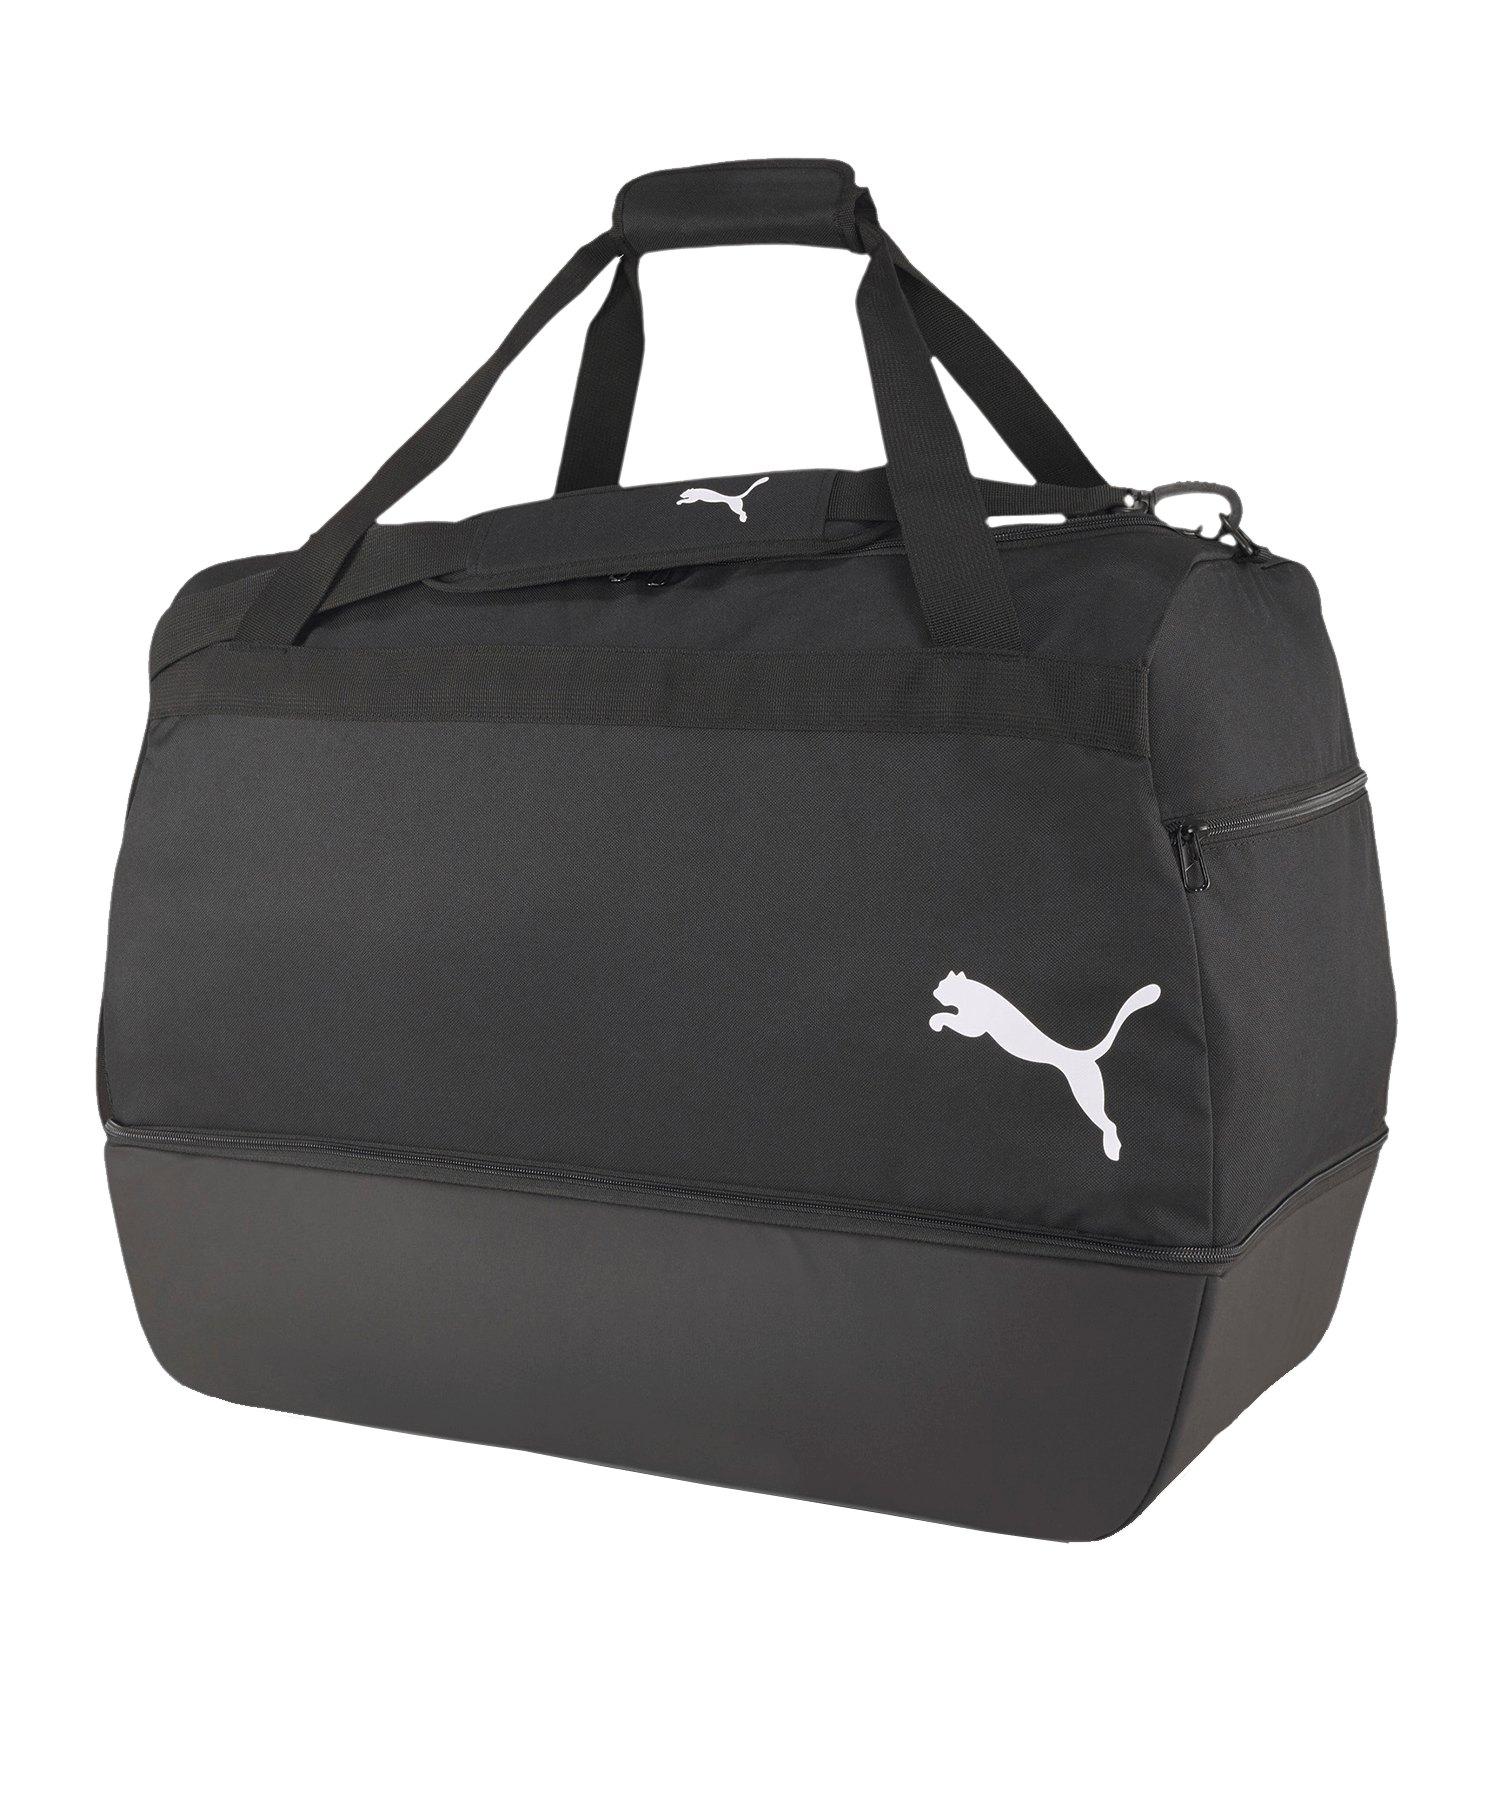 PUMA teamGOAL 23 Teambag Sporttasche BC Gr. M F03 - schwarz